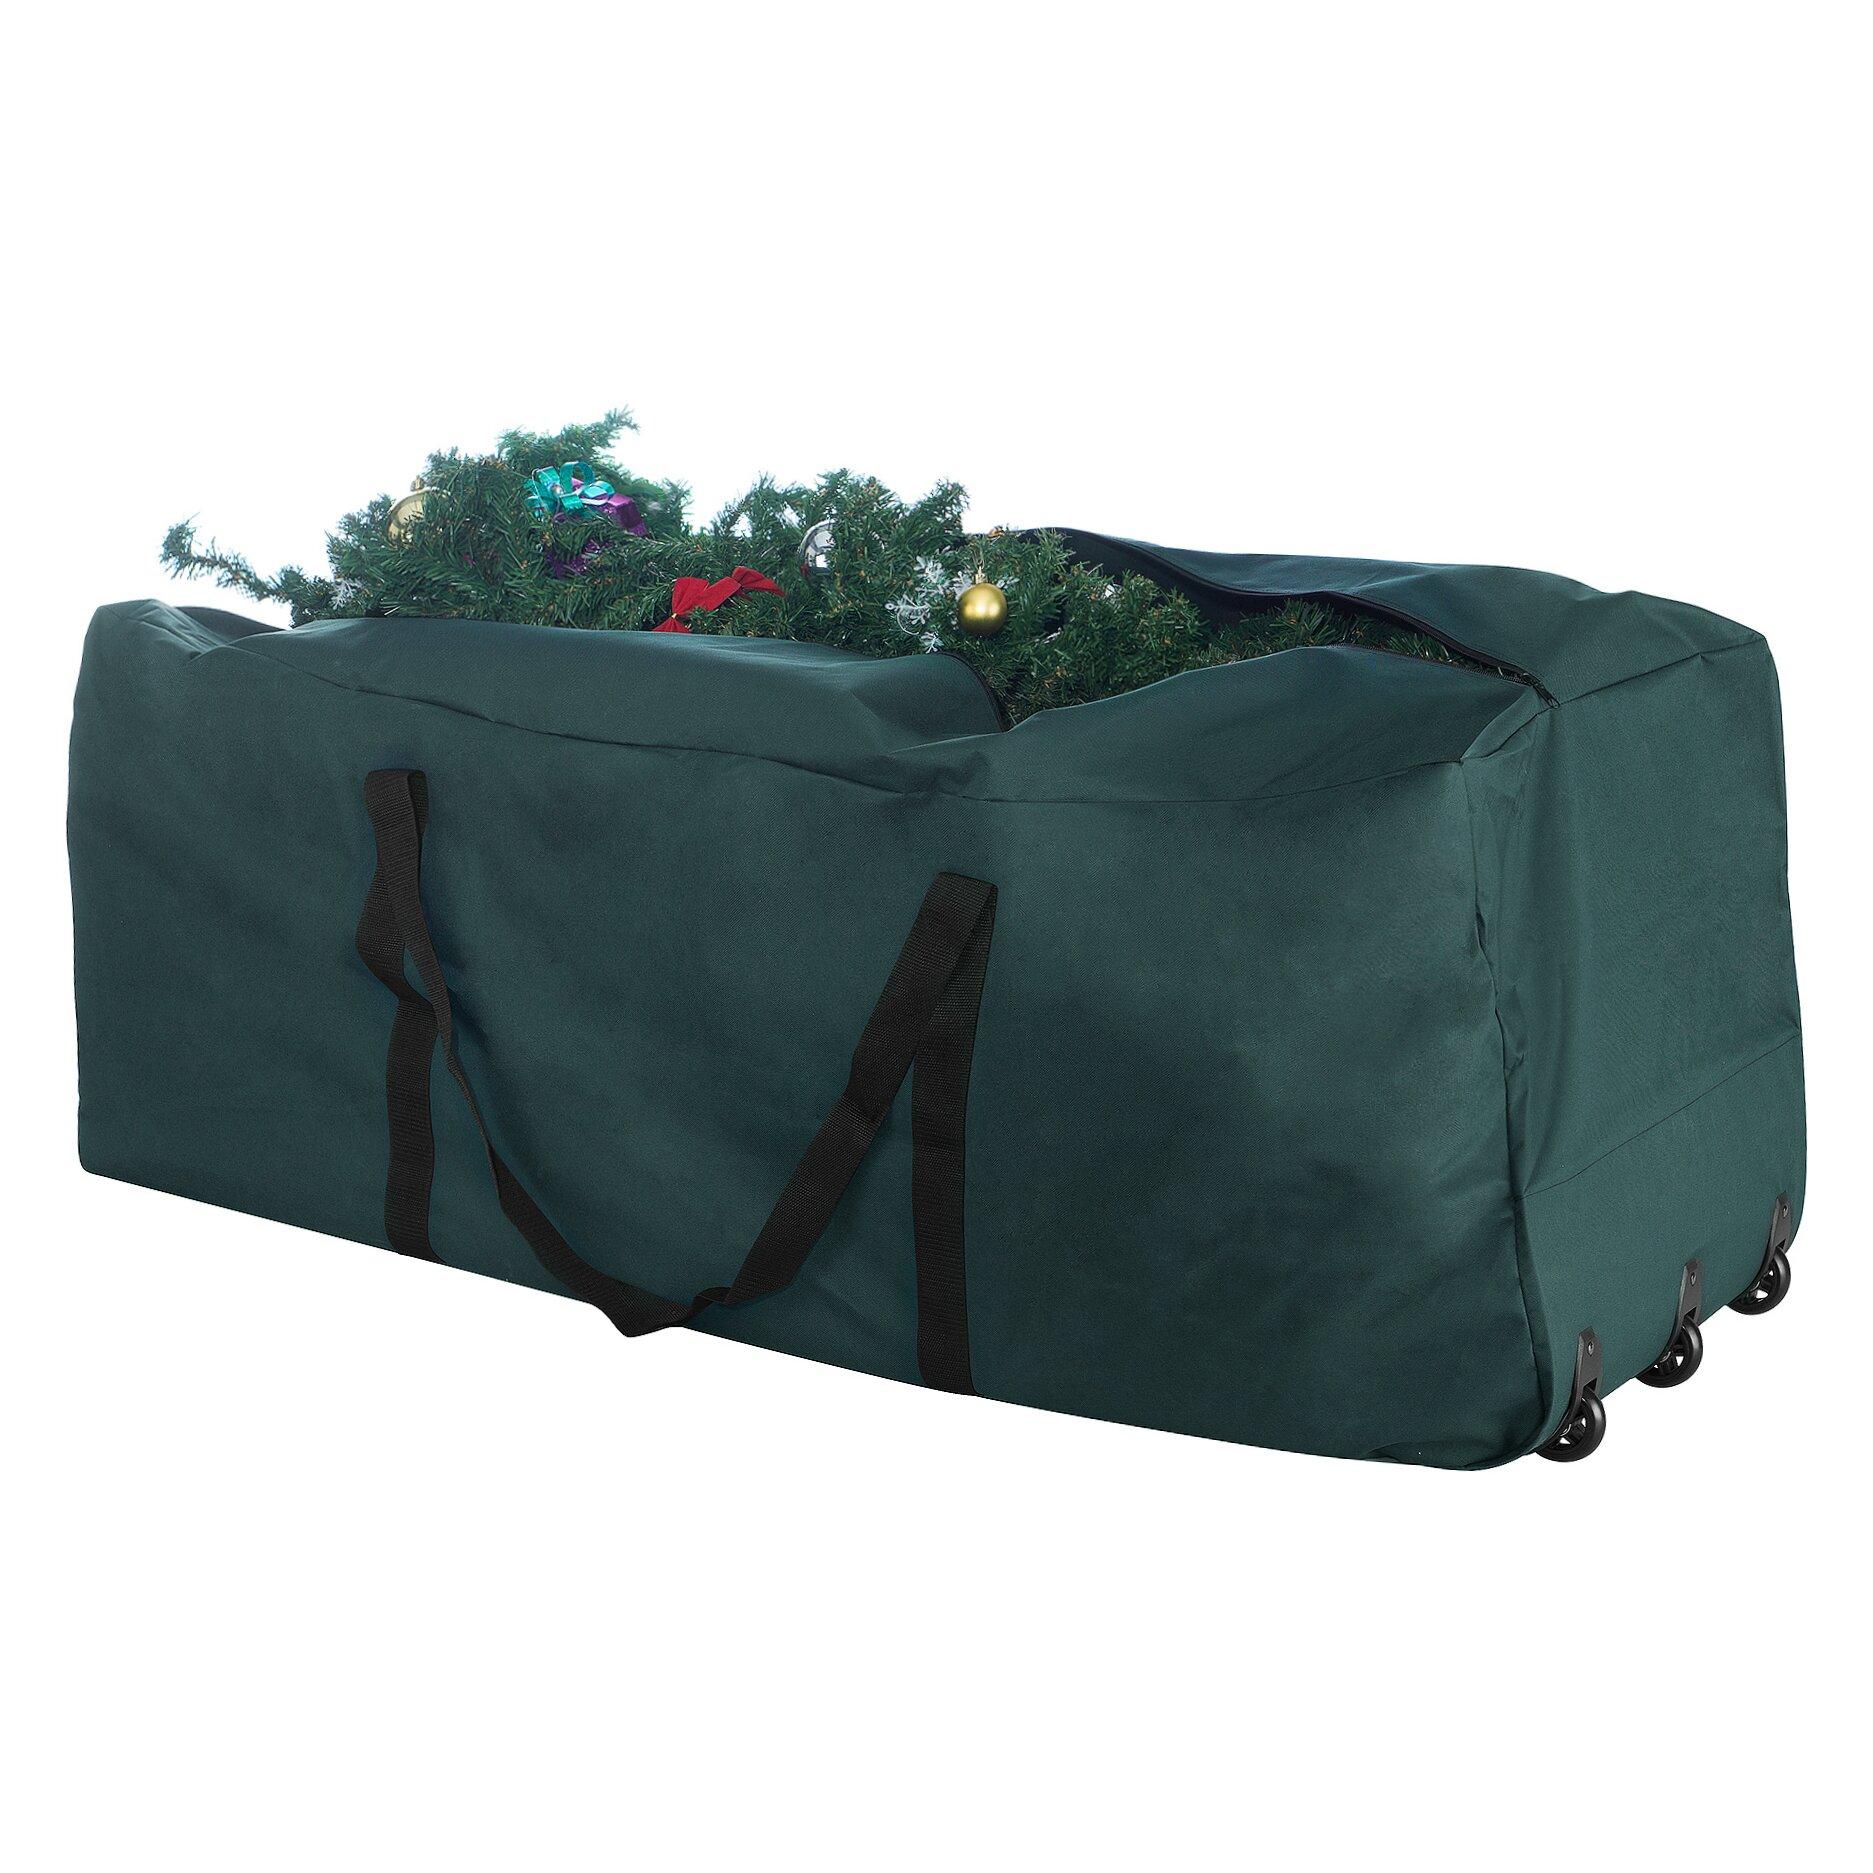 Elf Stor Premium Green Rolling